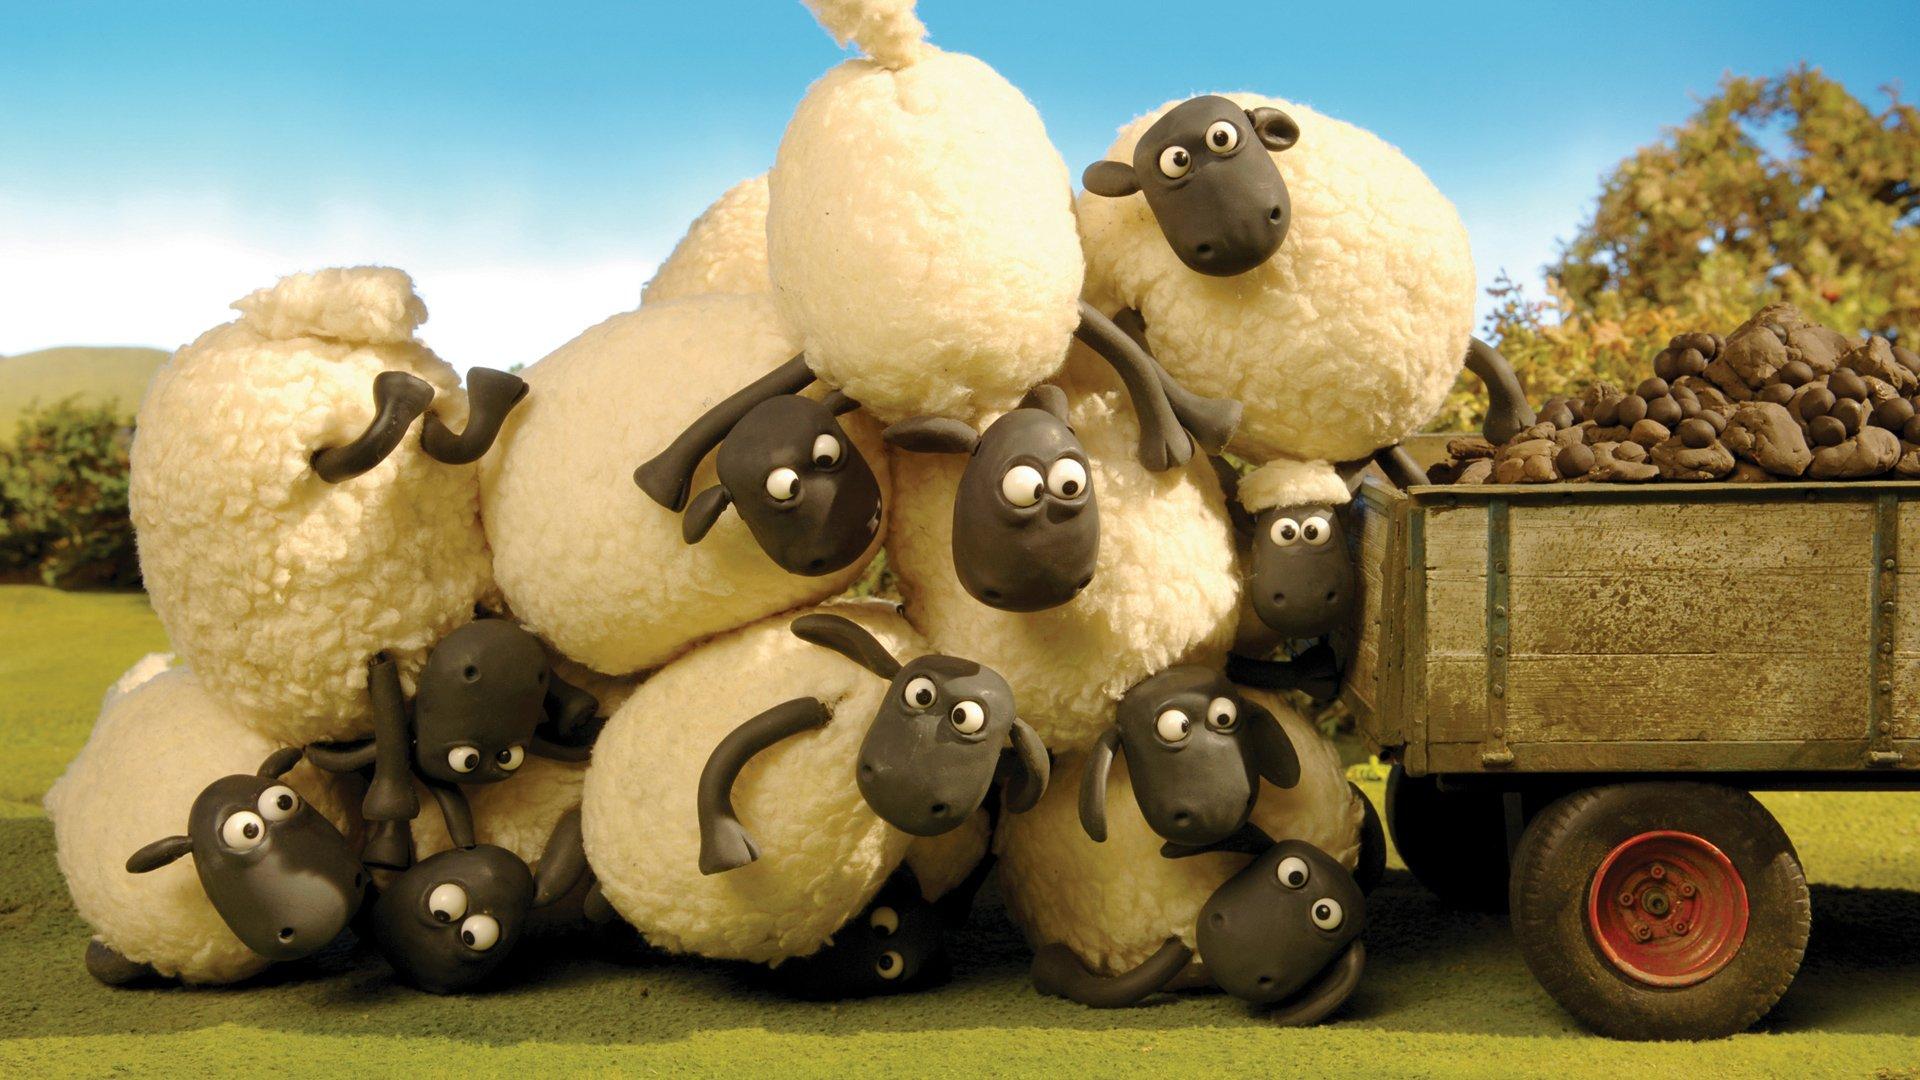 shaun the sheep wallpaper download